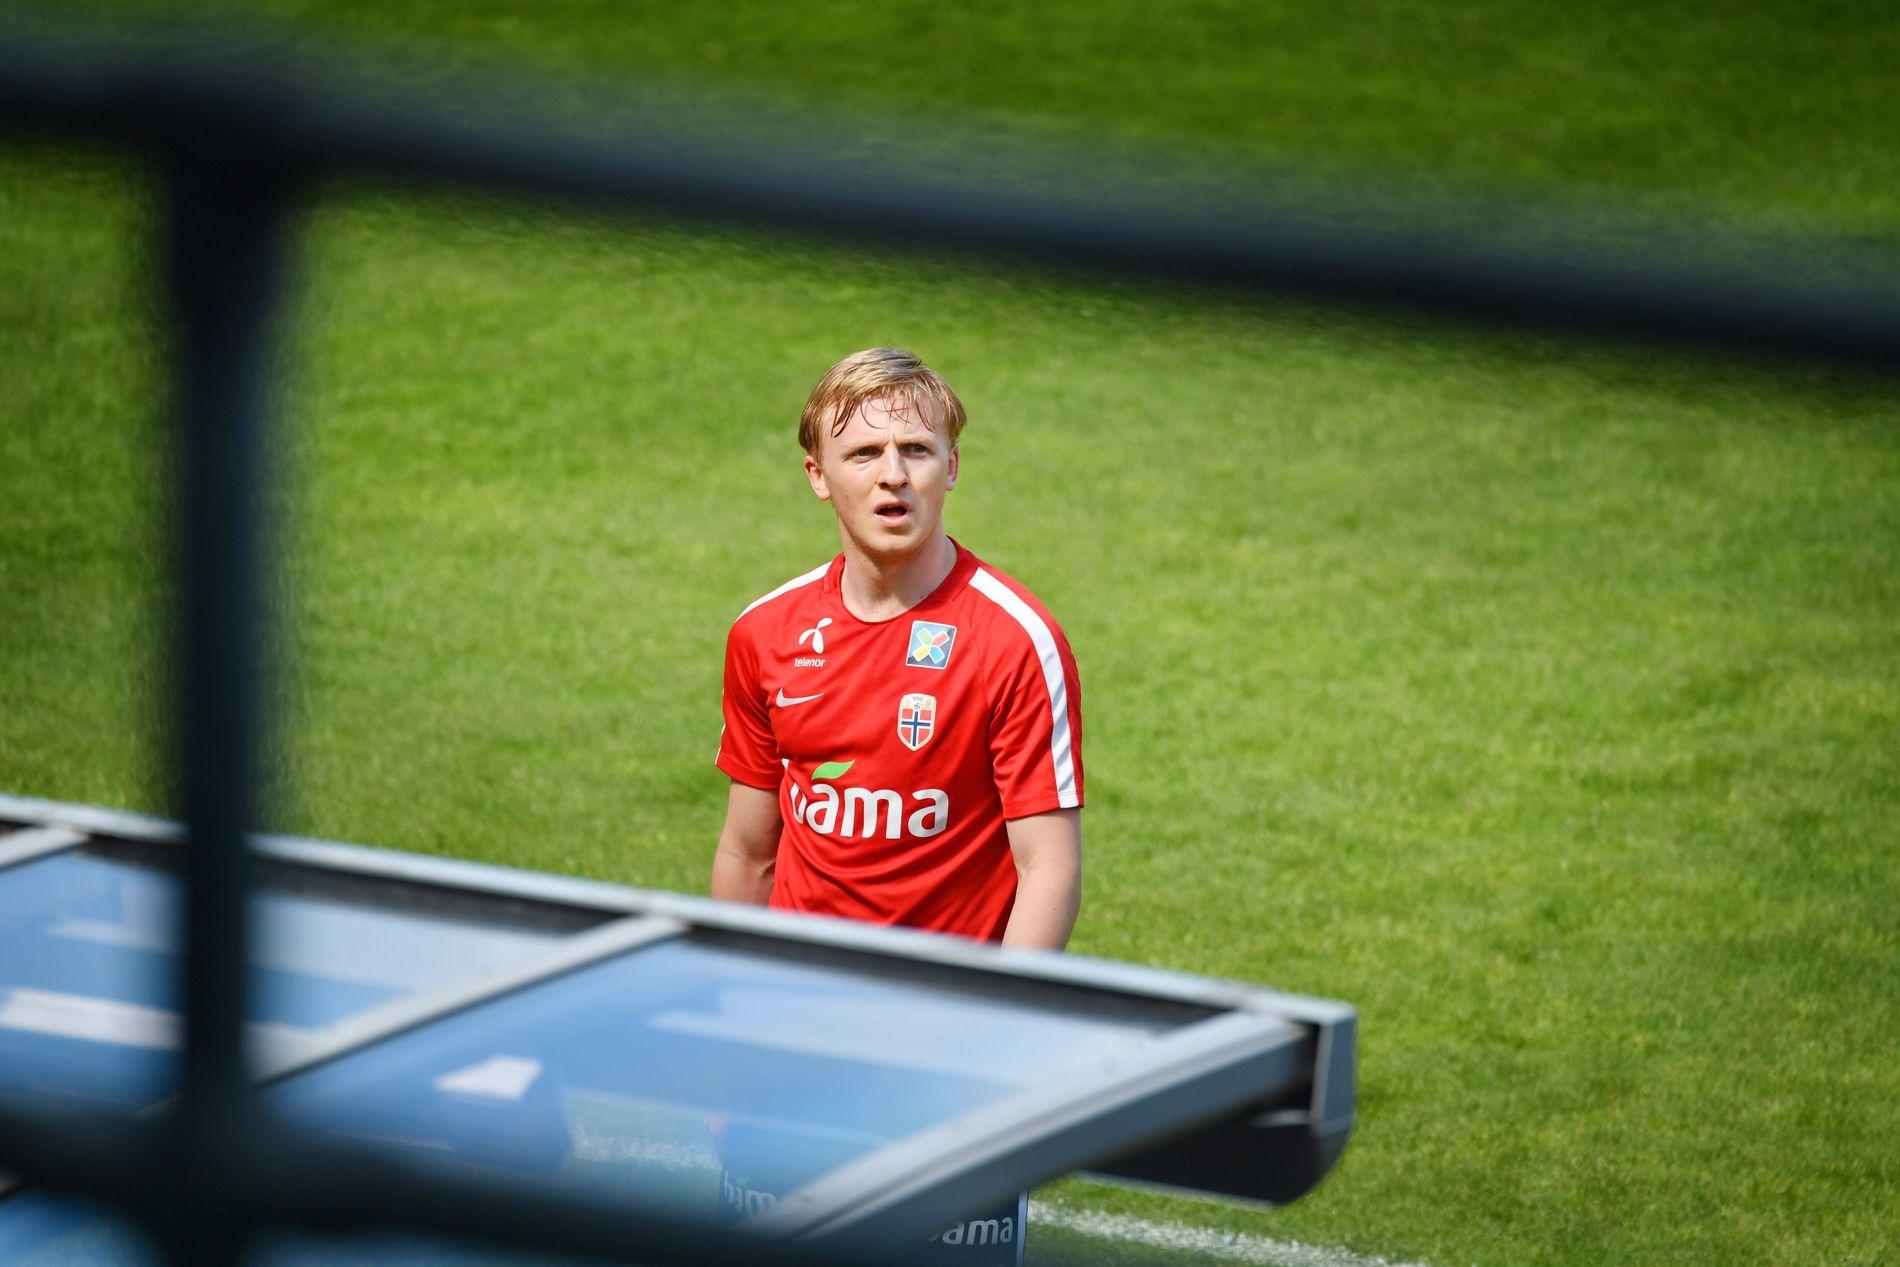 FÅR SNART VITE UTSIKTENE: Mats Møller Dæhli under tirsdagens landslagstrening på Ullevaal stadion.